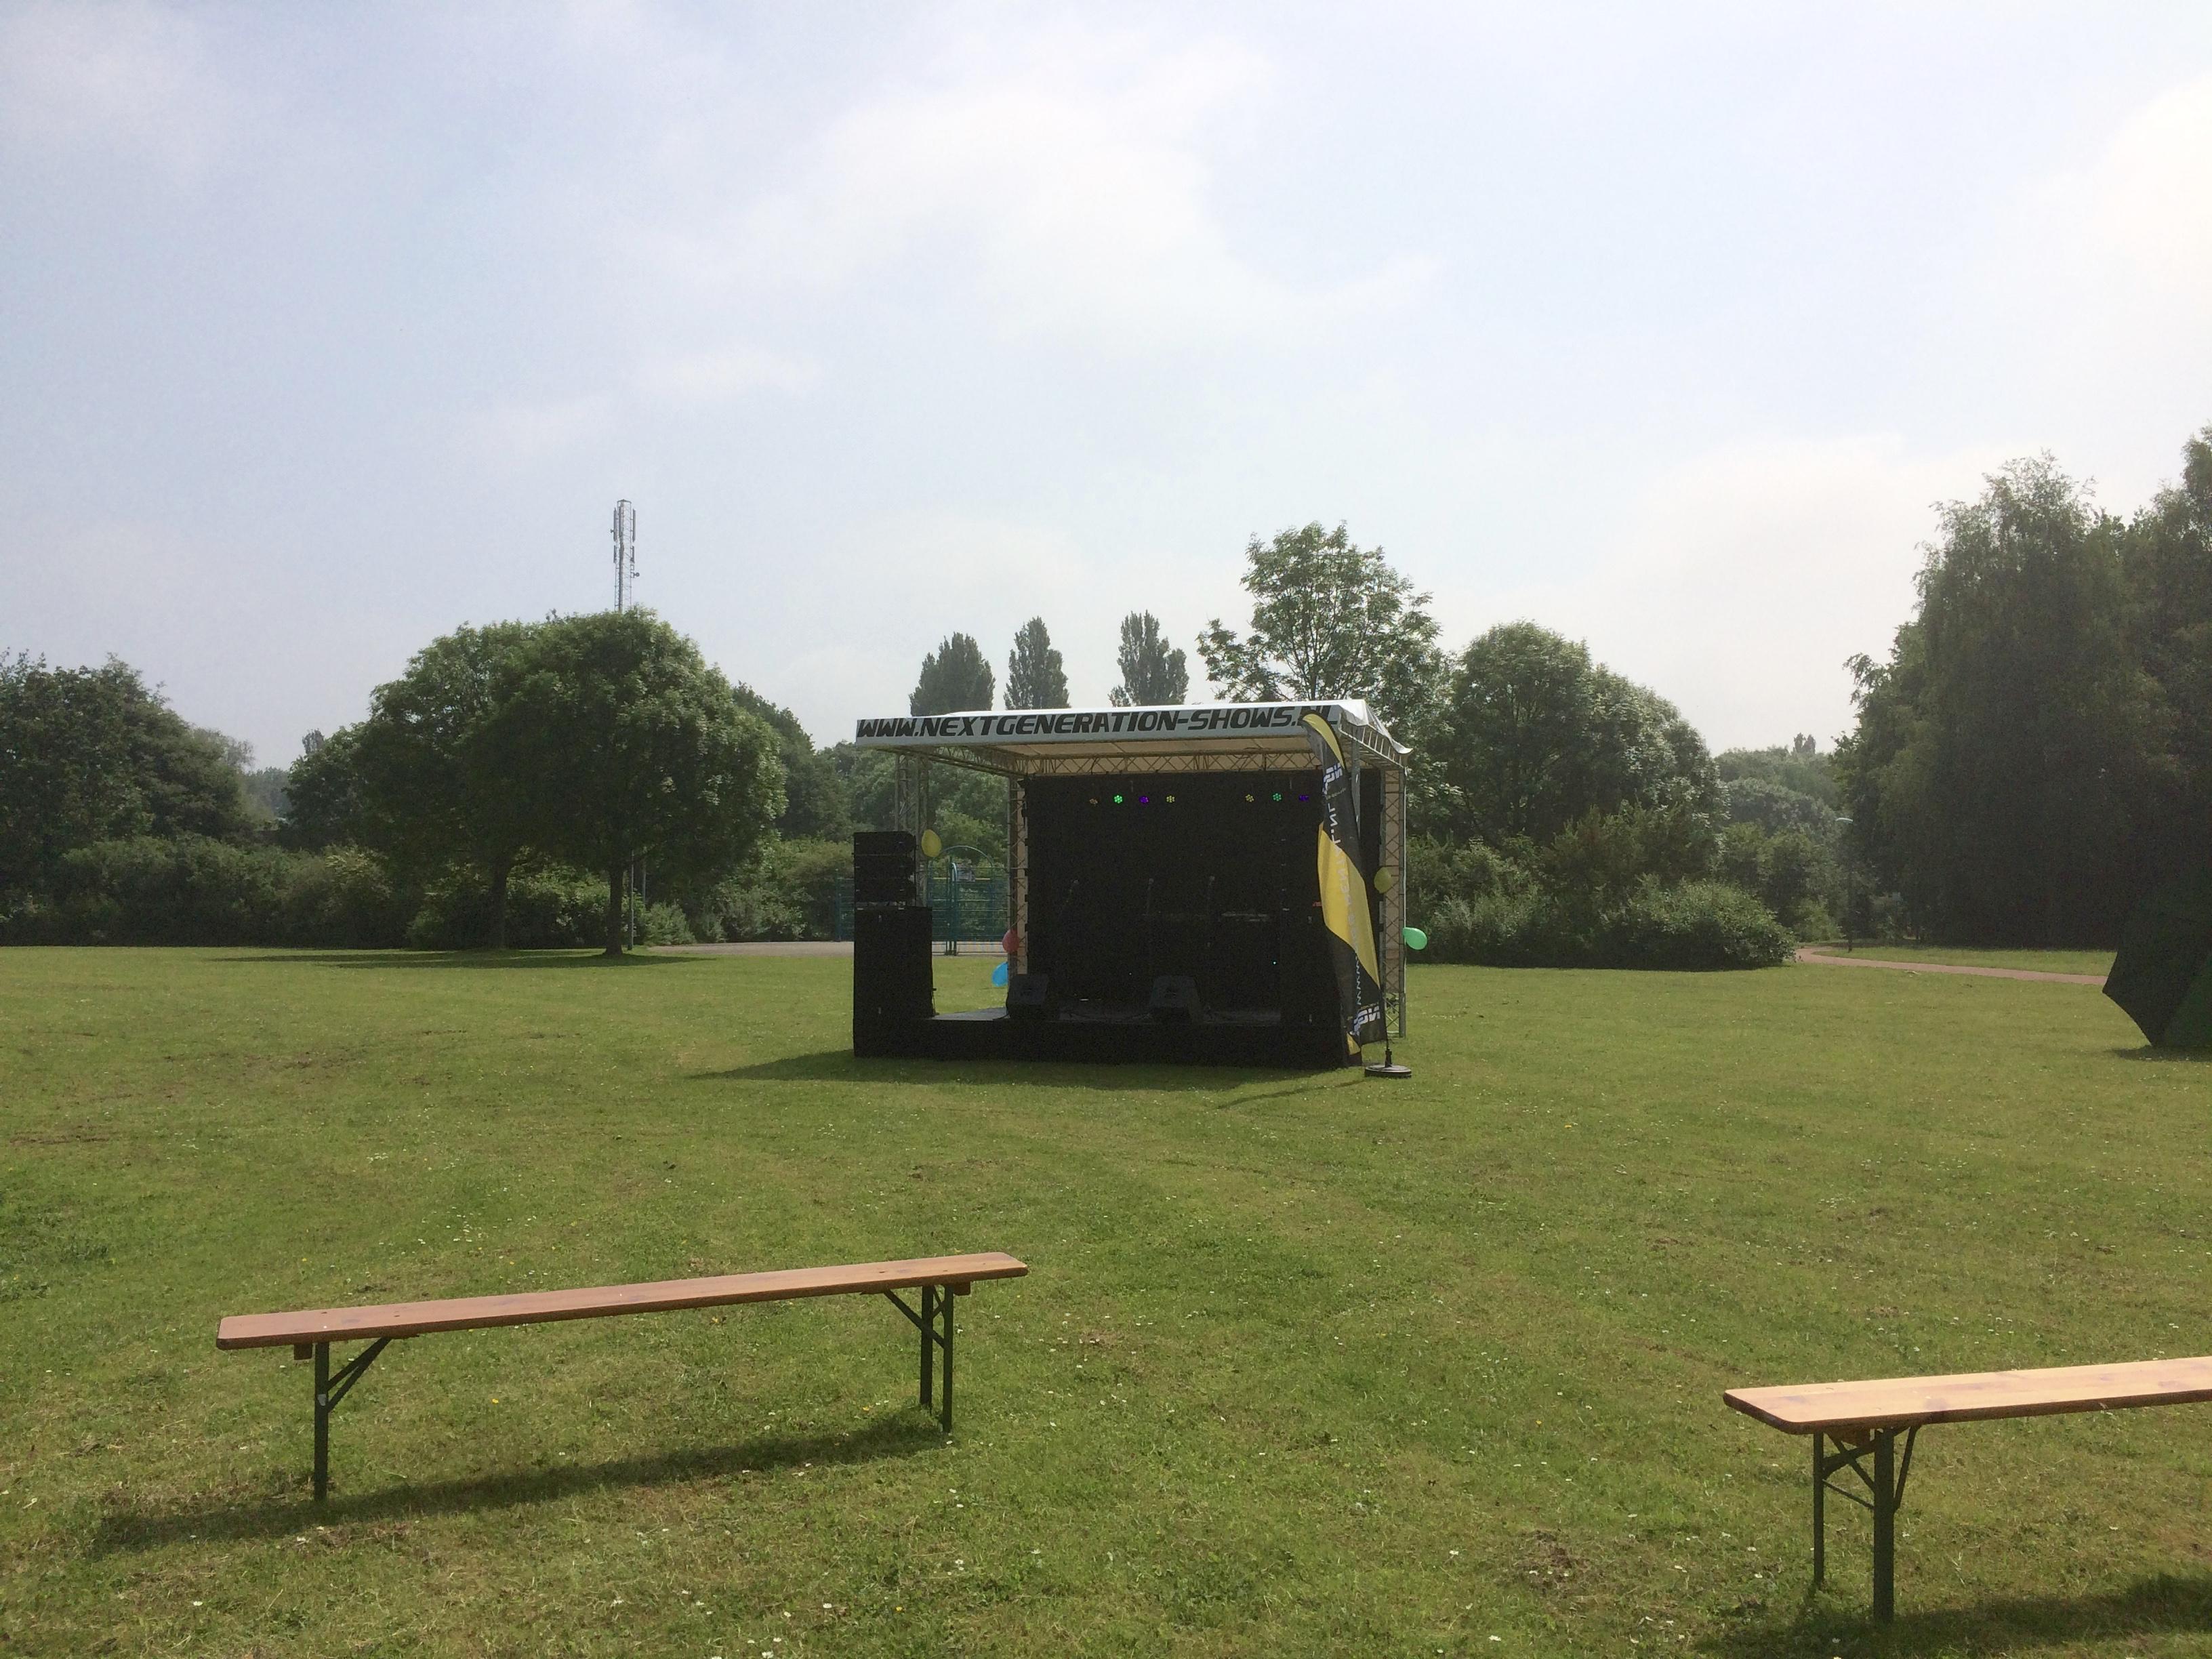 Zomerparkfeest Dordrecht 3